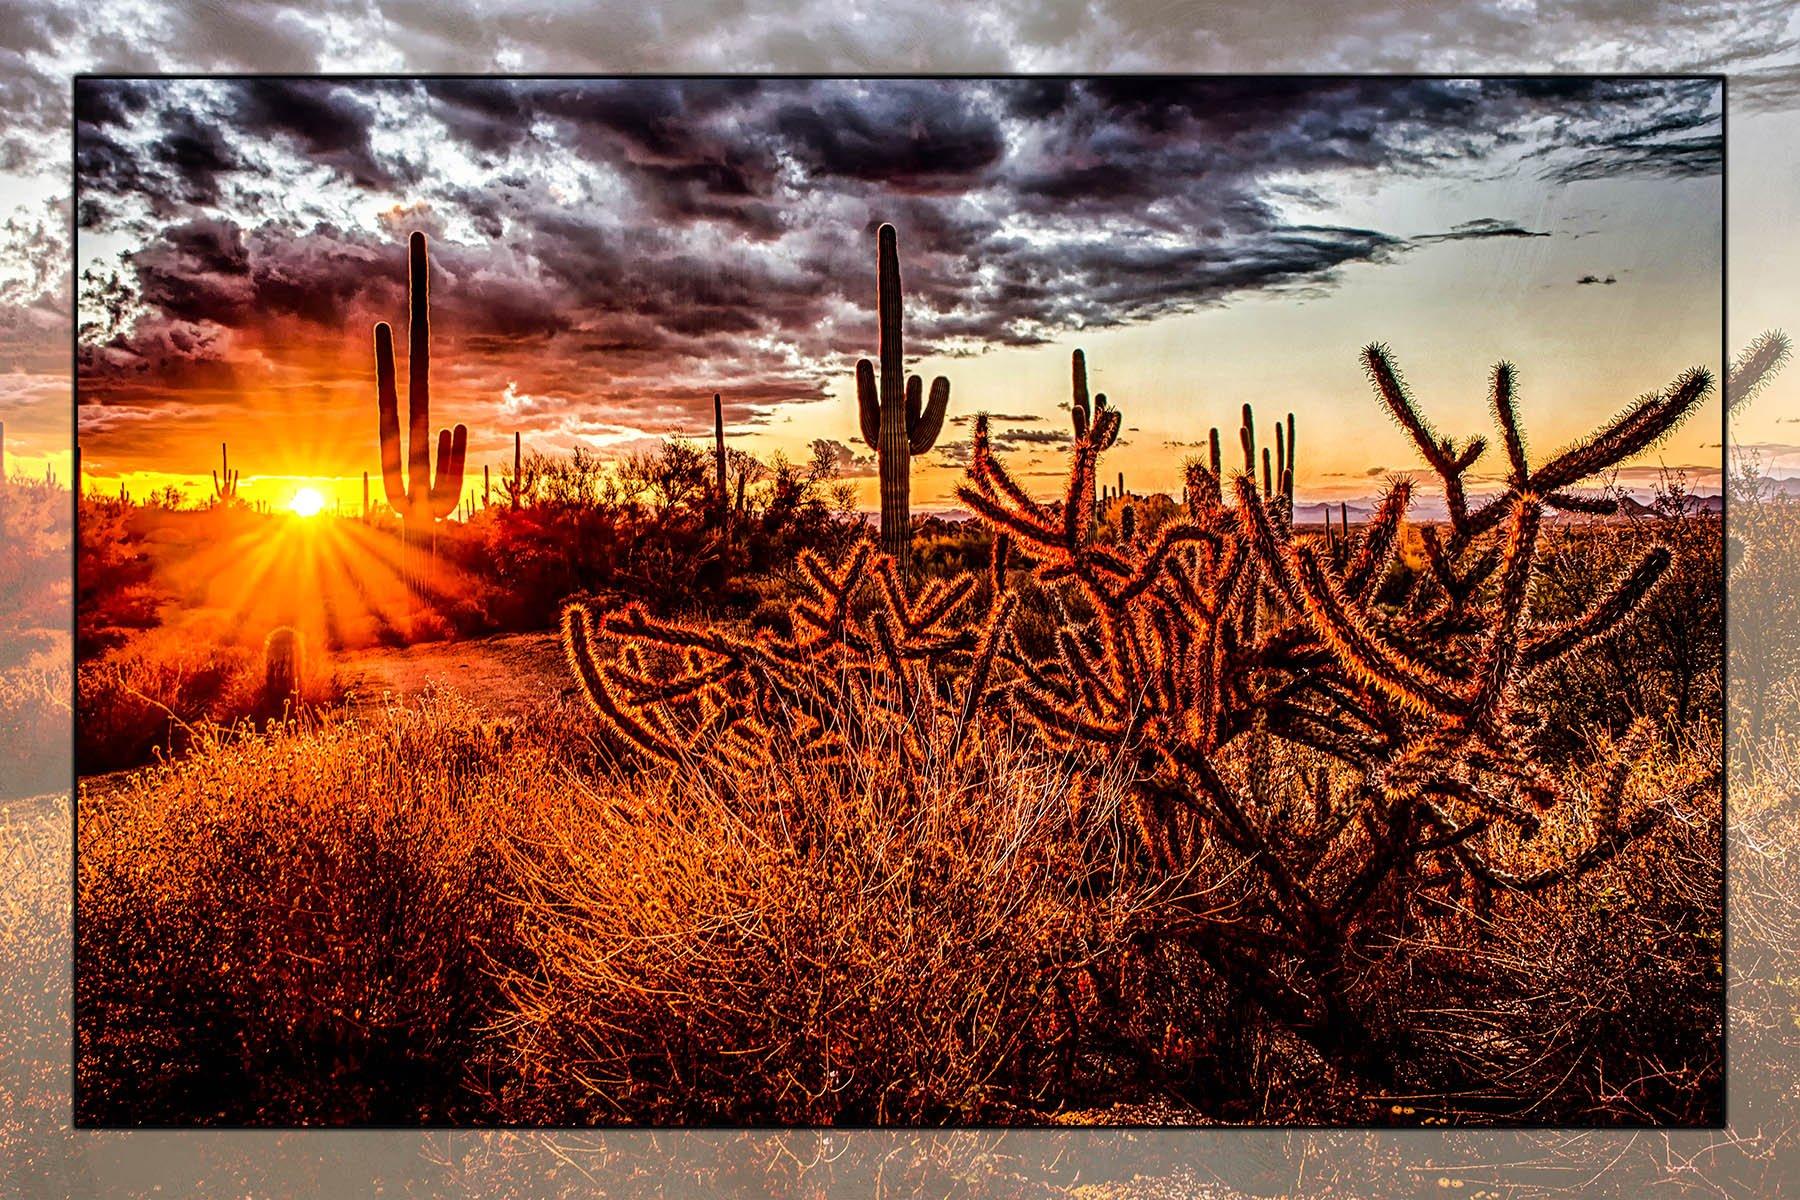 Cactus Sunset Panel by Nancy Fuller